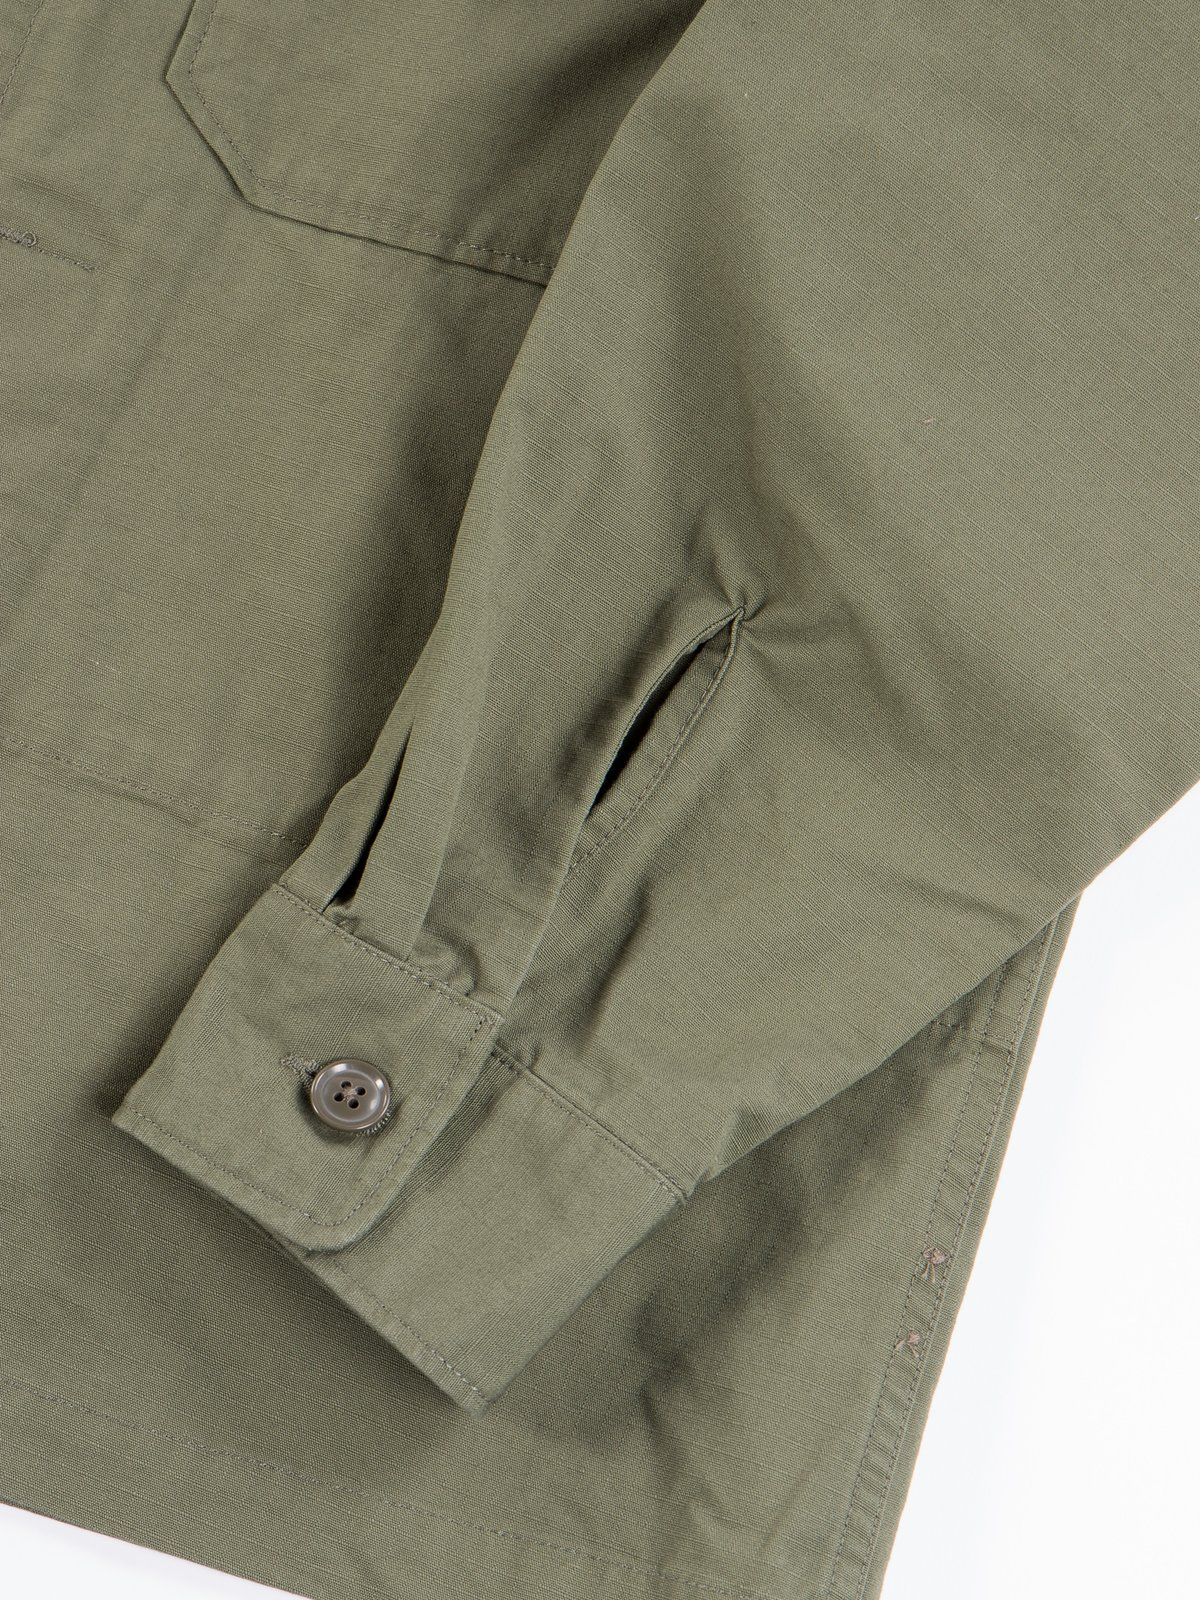 Olive Cotton Ripstop MC Shirt Jacket - Image 5